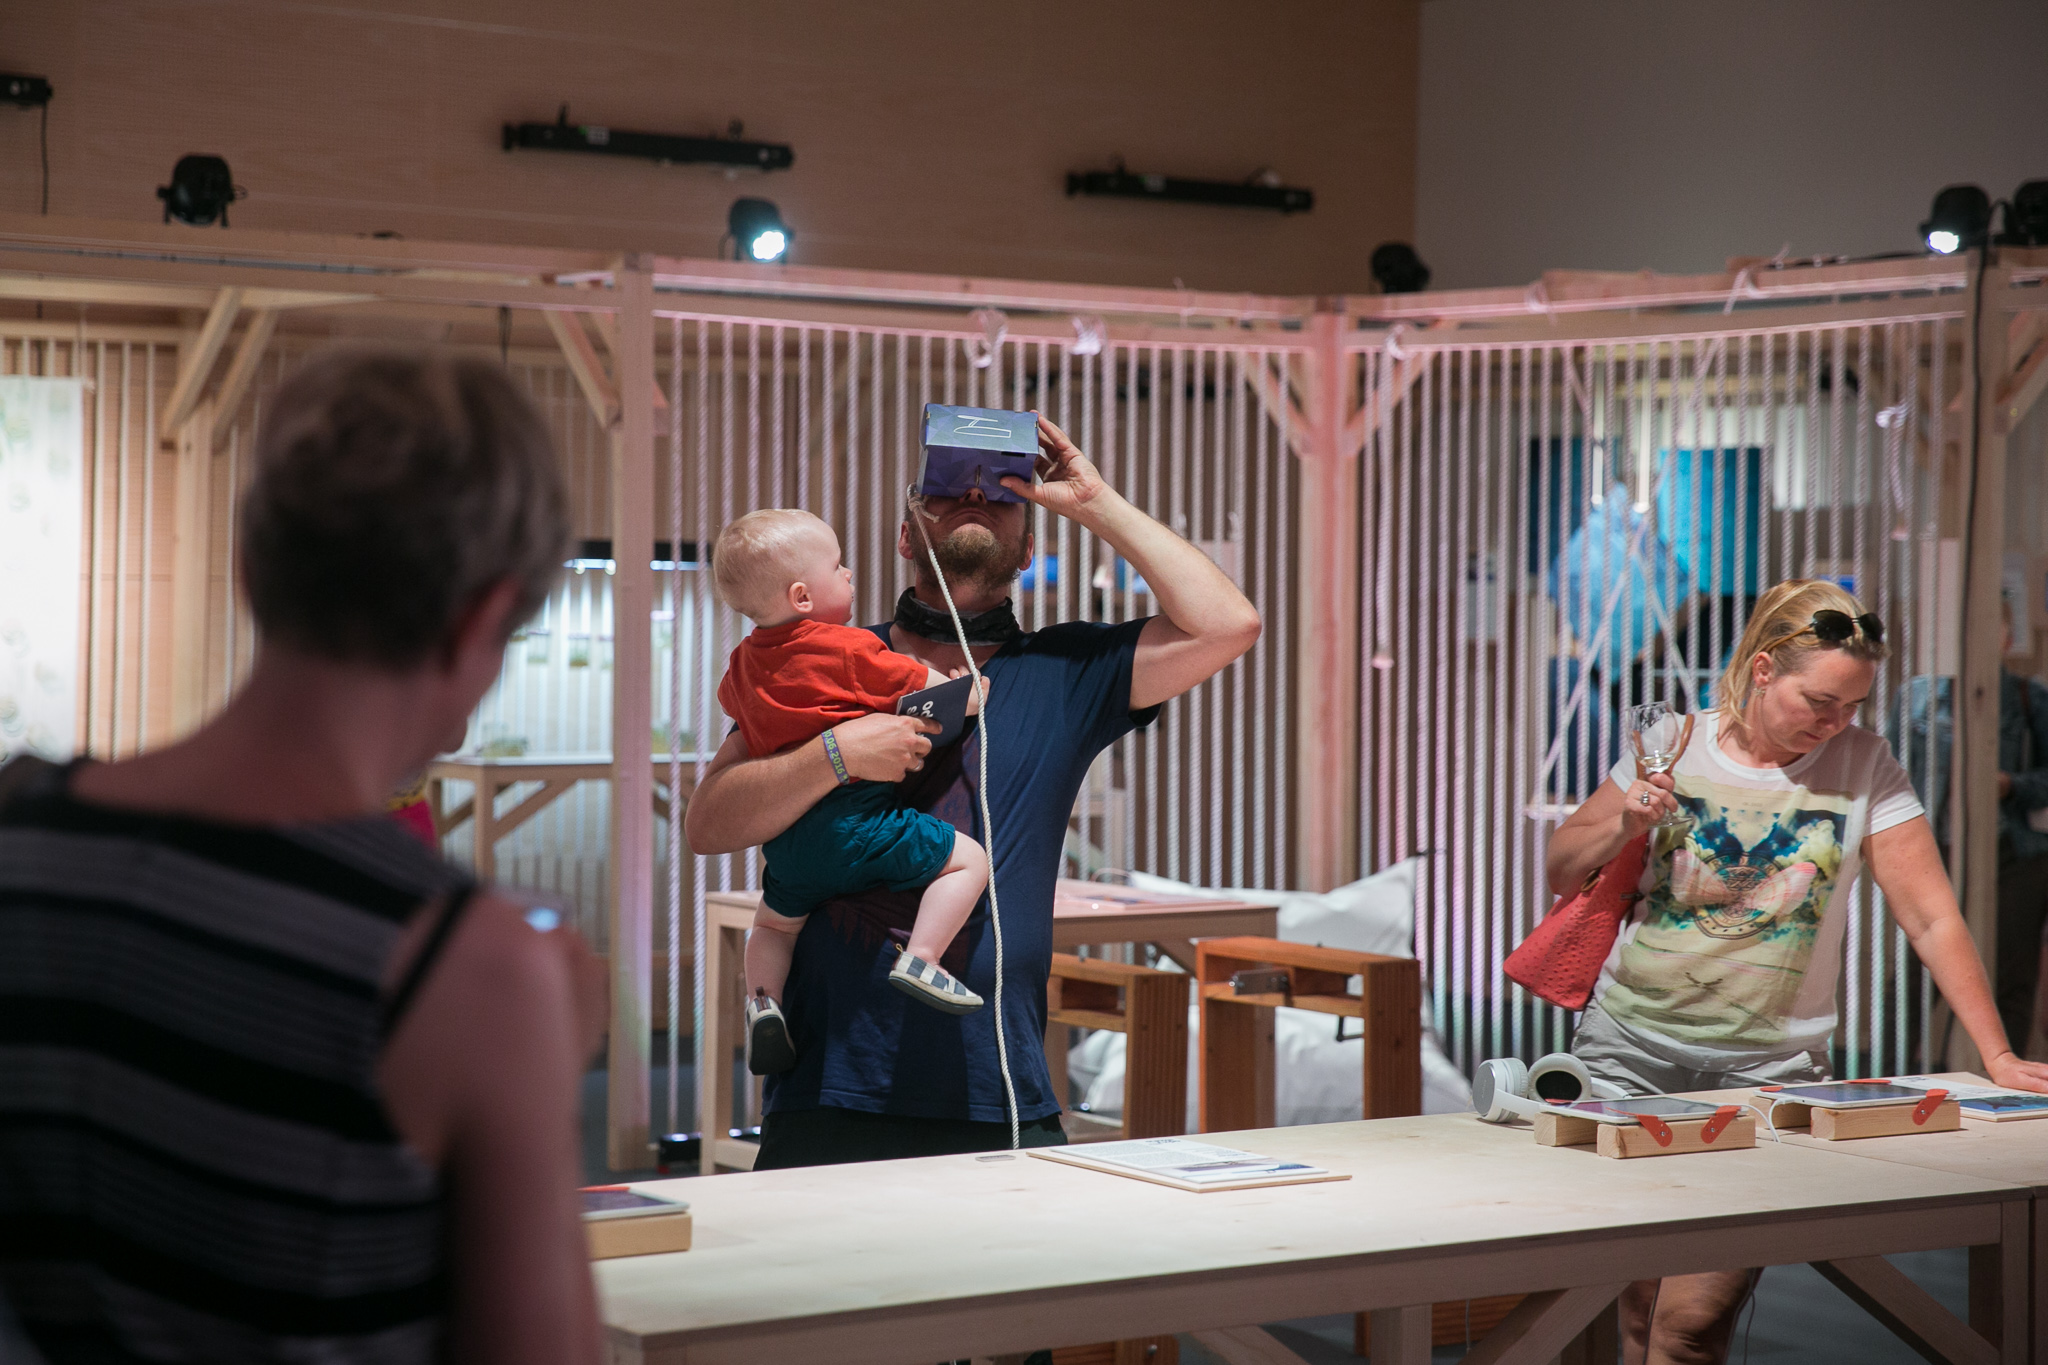 Gdynia Design Days - July 6-14, 2019